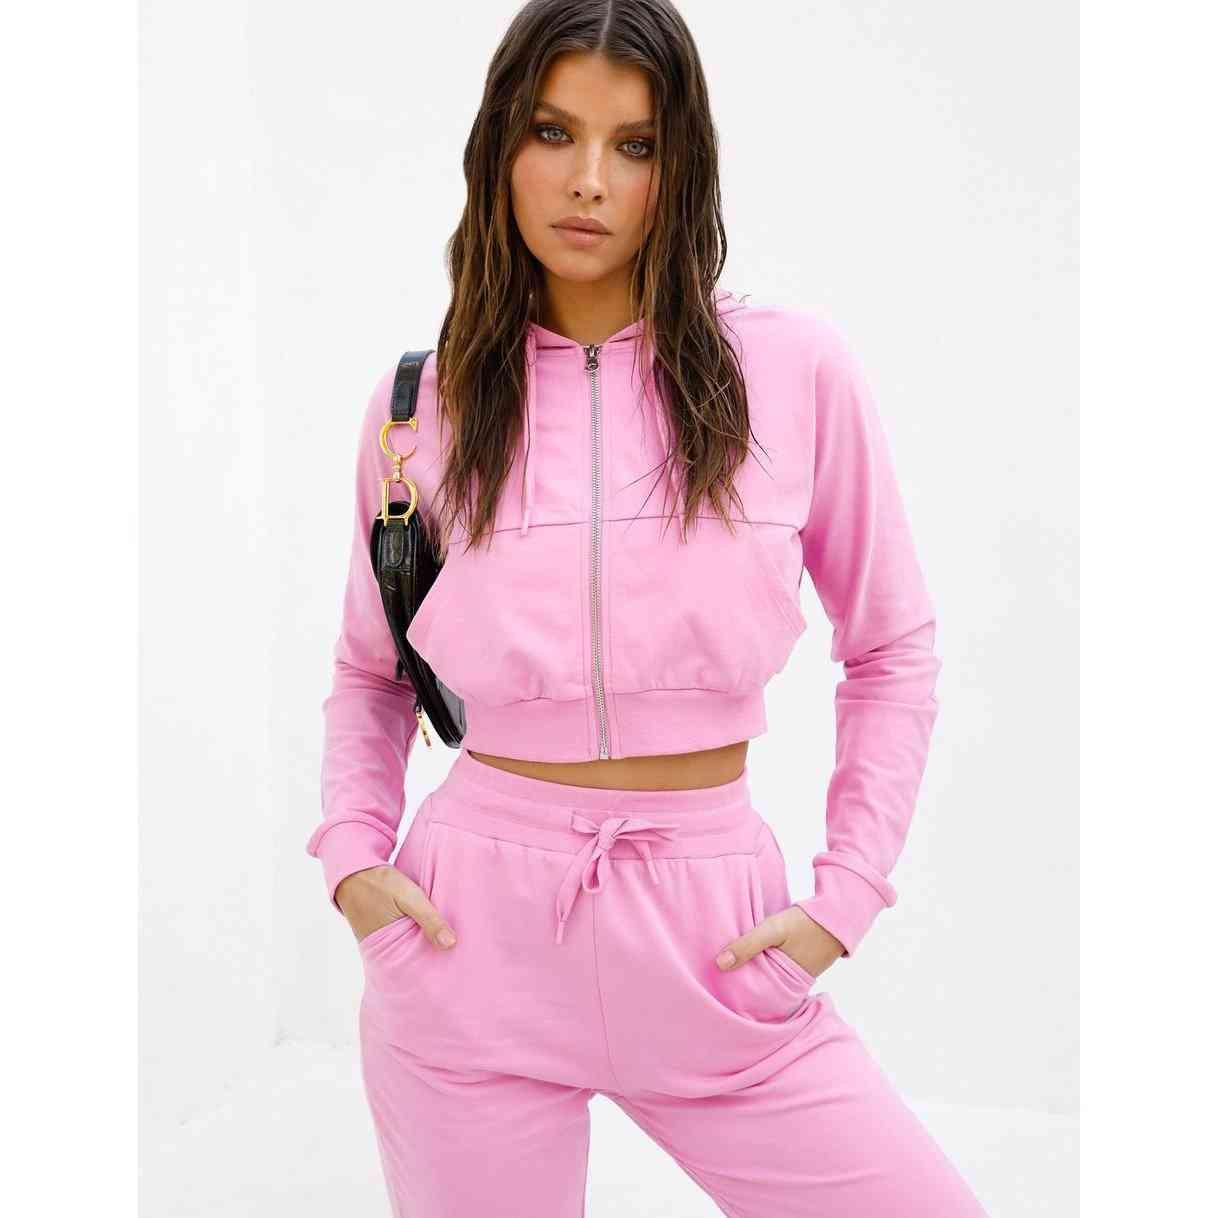 Tie-dye Gym Fitness, Clothing Yoga Suit, Sportswear